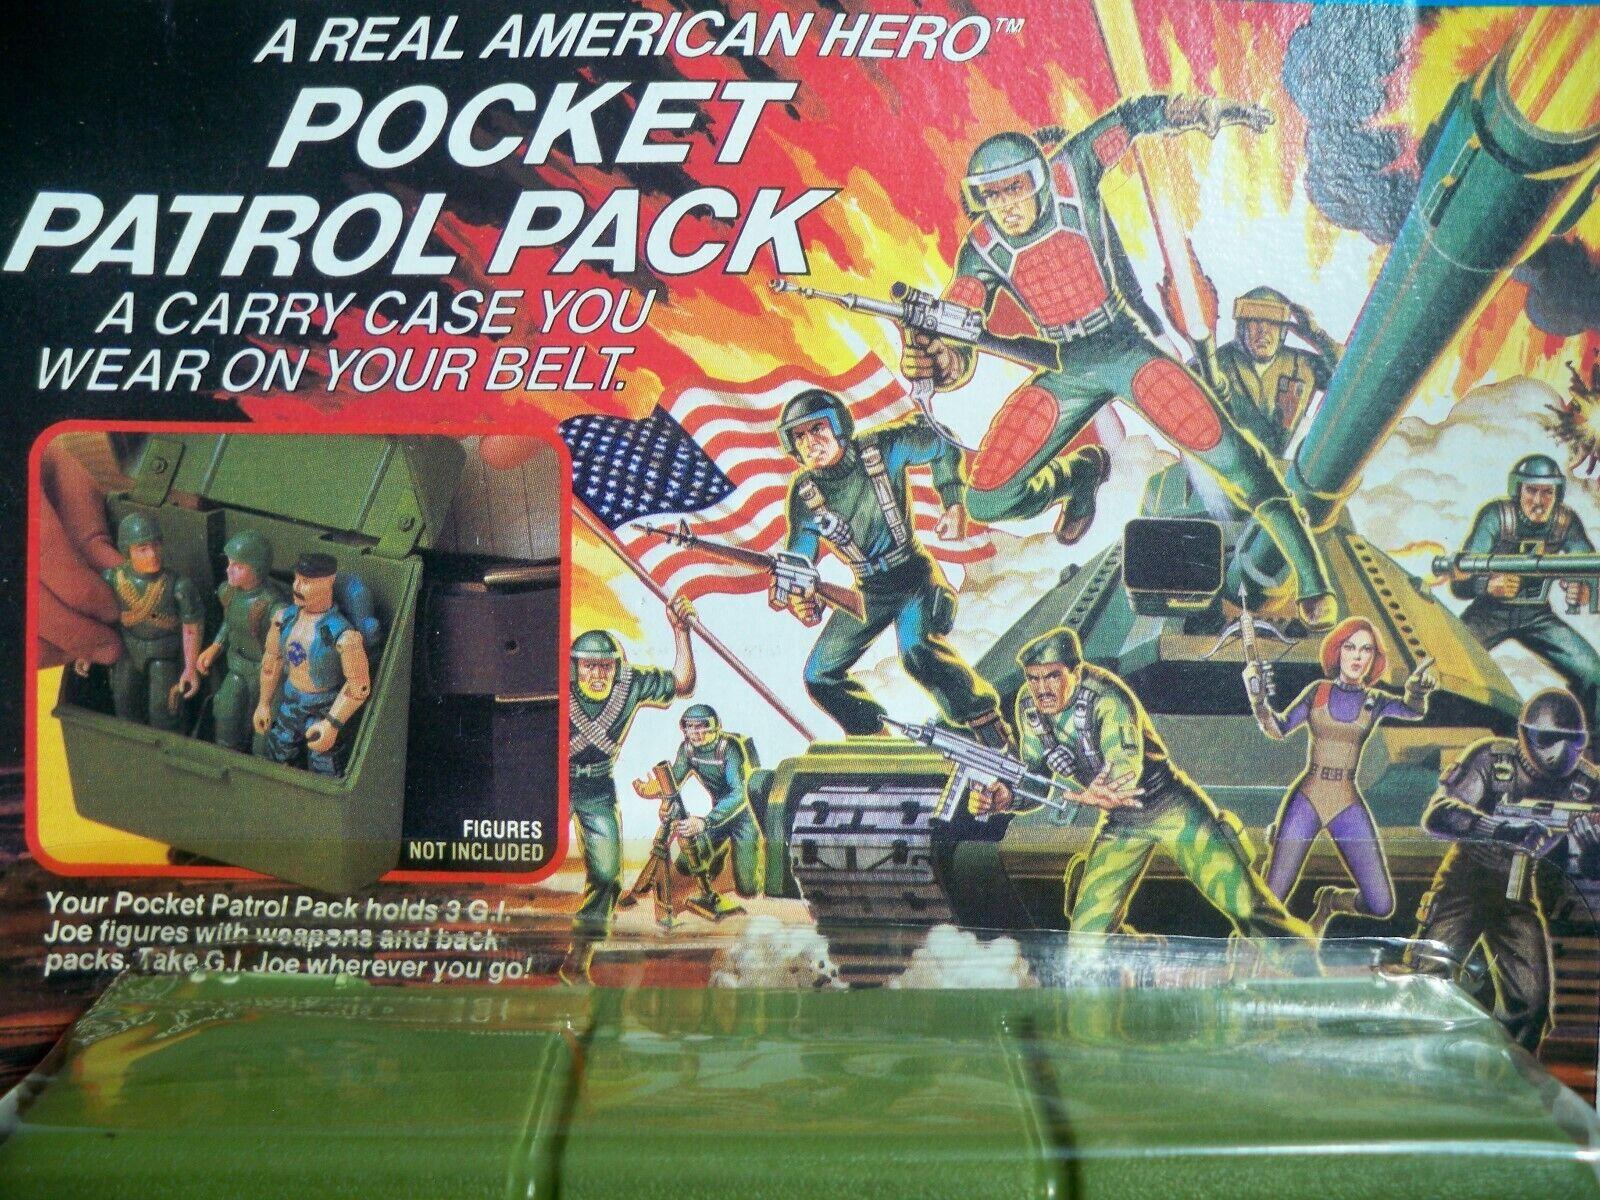 Paquete de patrulla K195138 Pocket MOC menta en tarjeta sellada 1988 Gi Joe Original Vintage